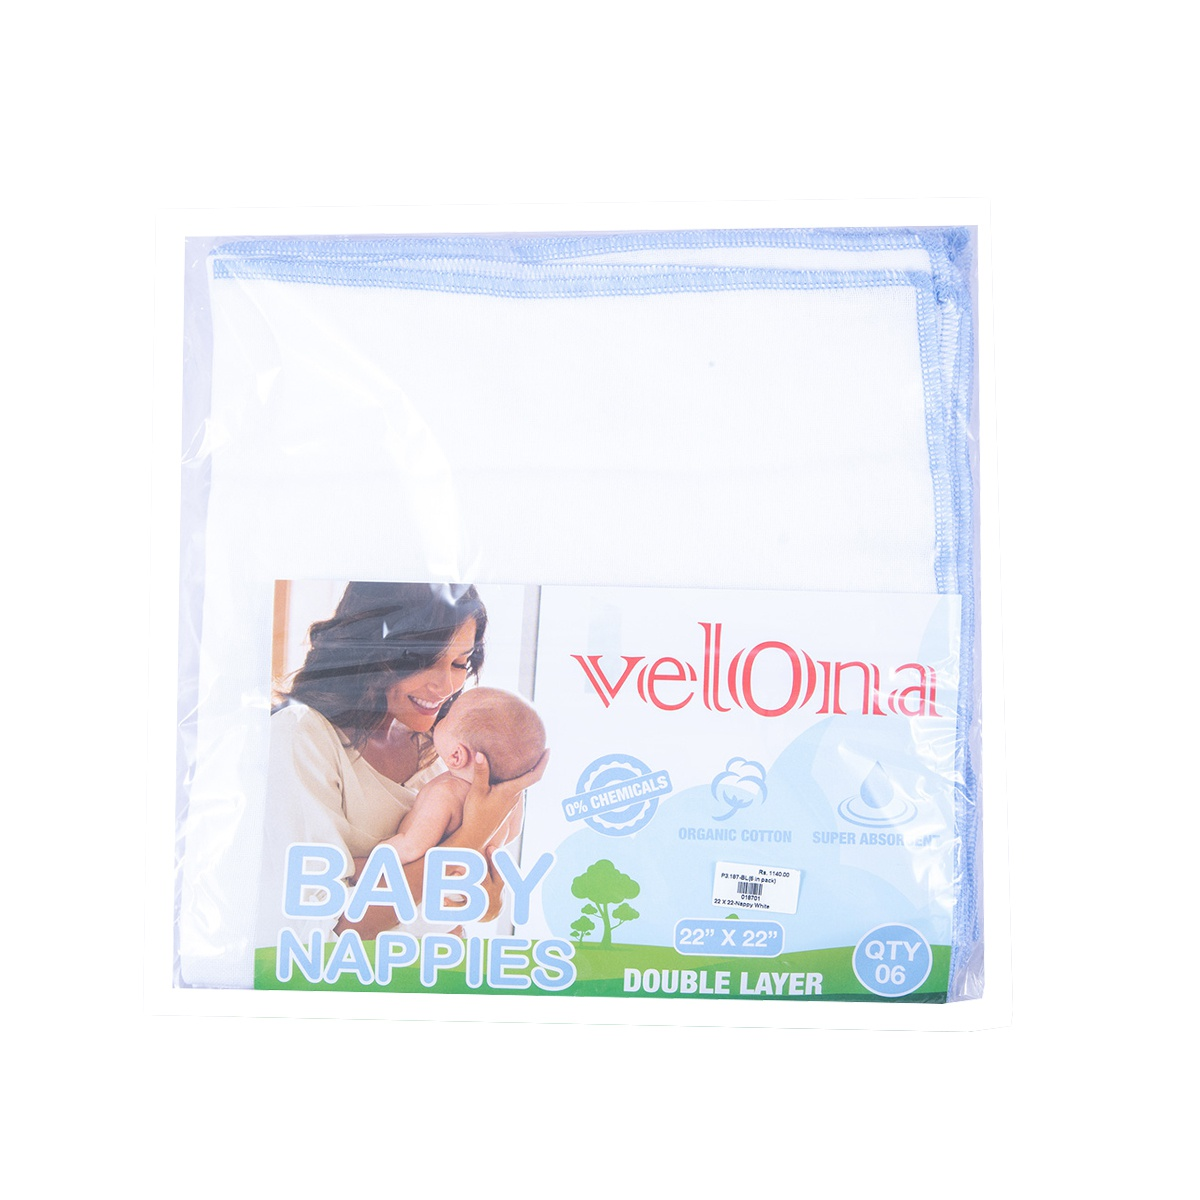 Velona Baby Nappy White With A Blue Border 22*22 6Pcs - in Sri Lanka